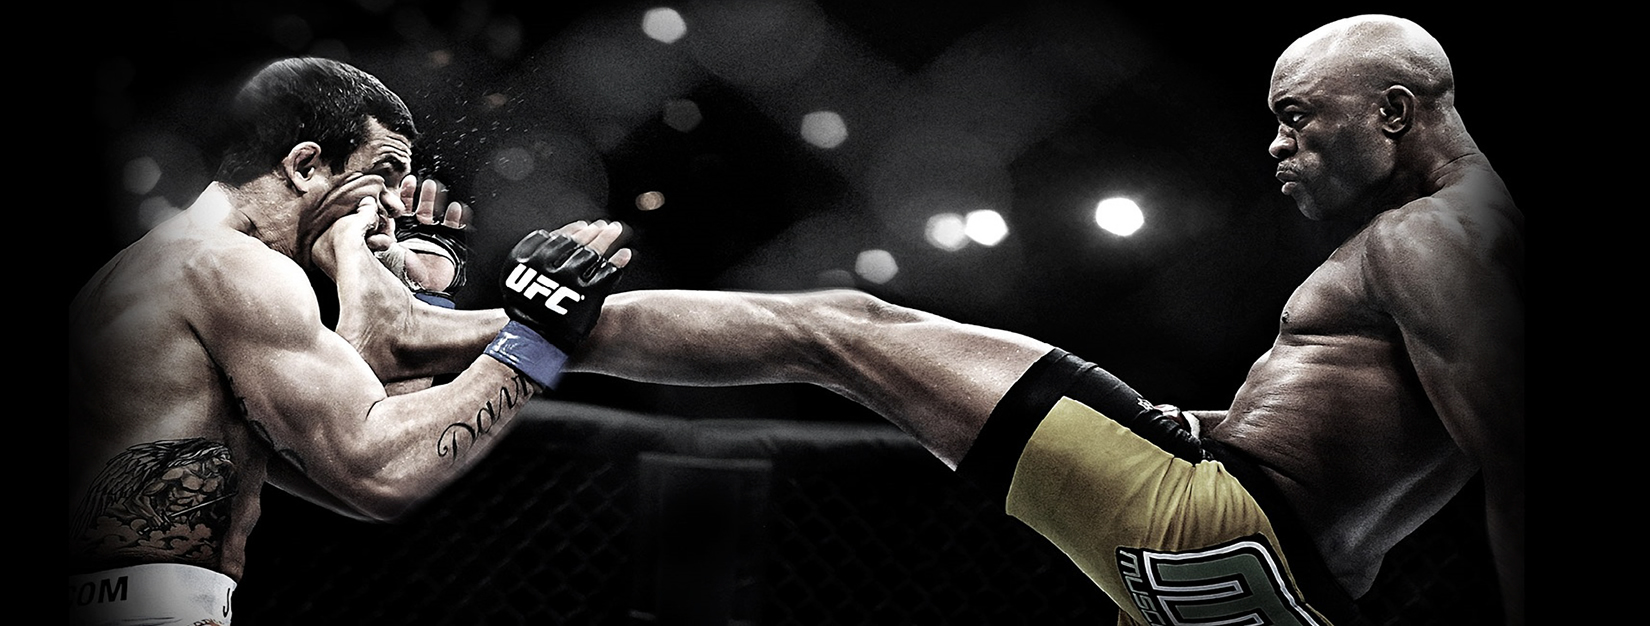 Sports MMA Wallpaper   MMA Gym   Kids Martial Arts San Clemente 1650x626